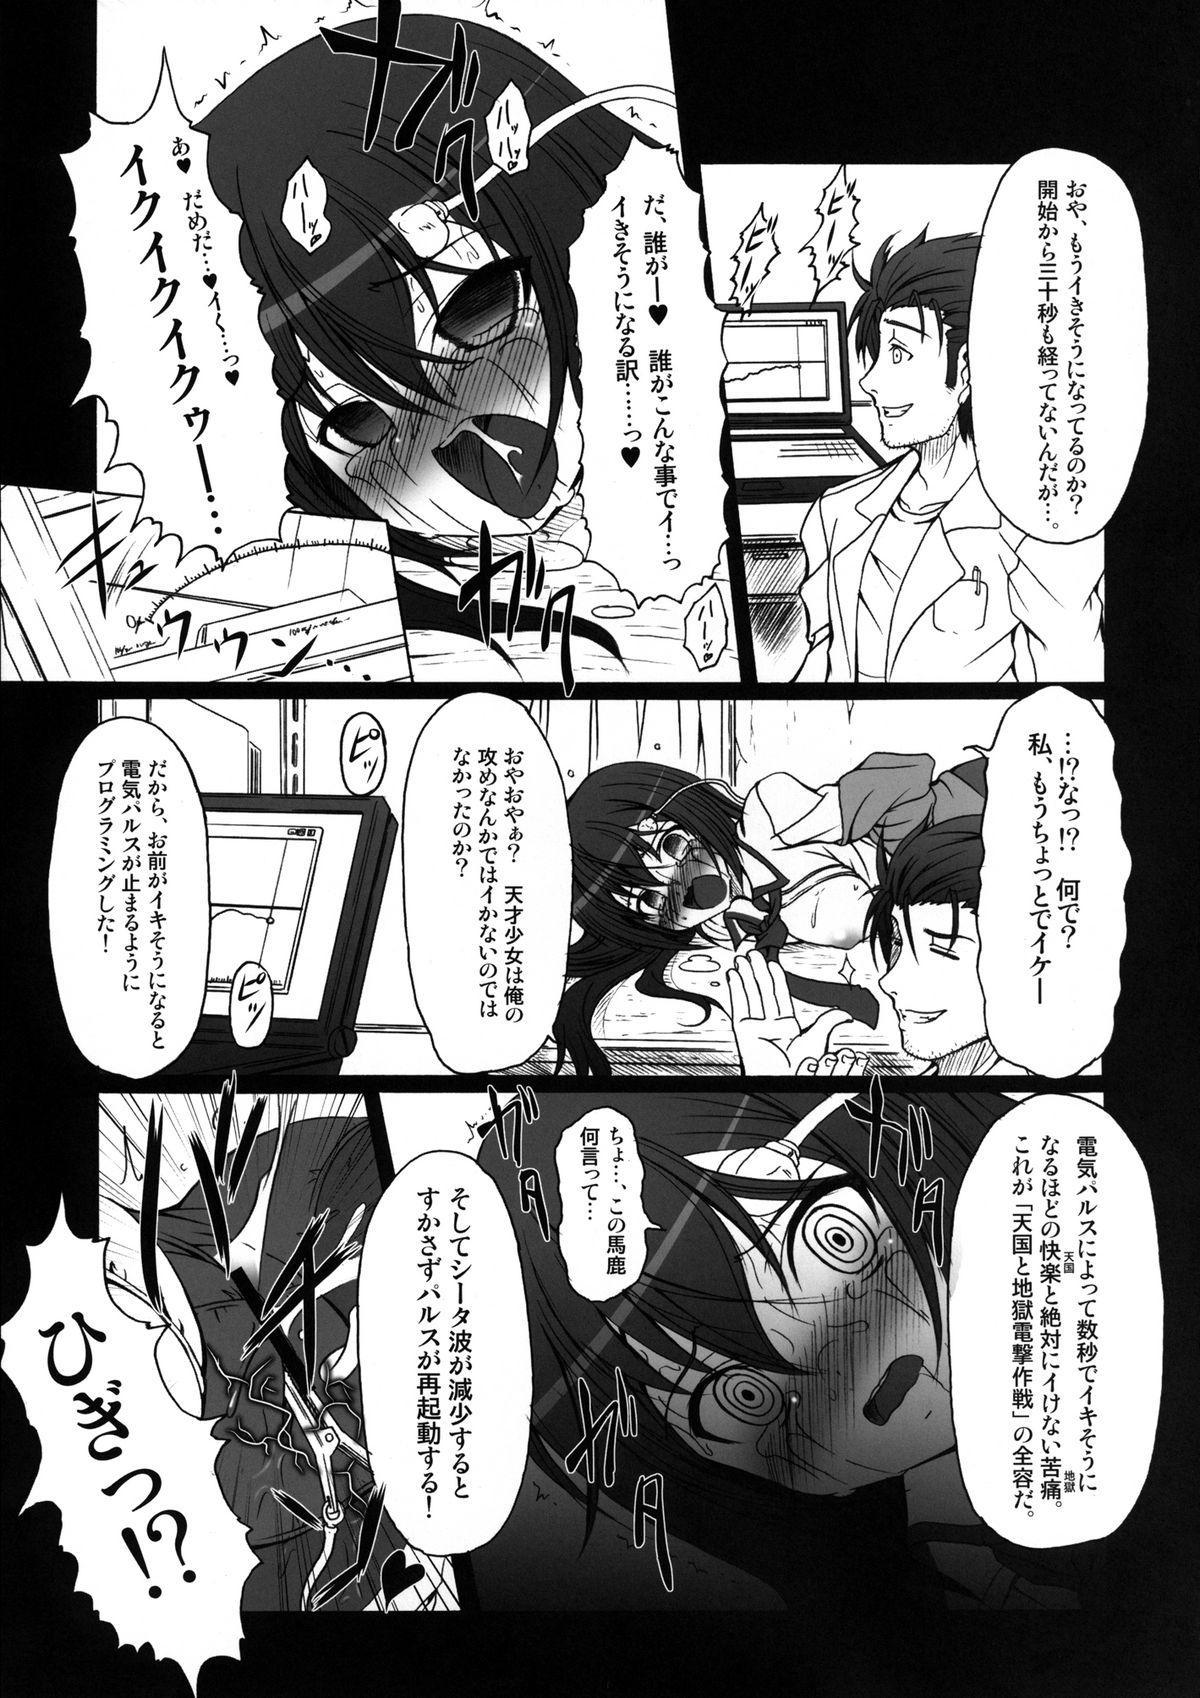 HOBBY'S BLOCK!! 14 Kairaku Tousaku no Ecstasy 14